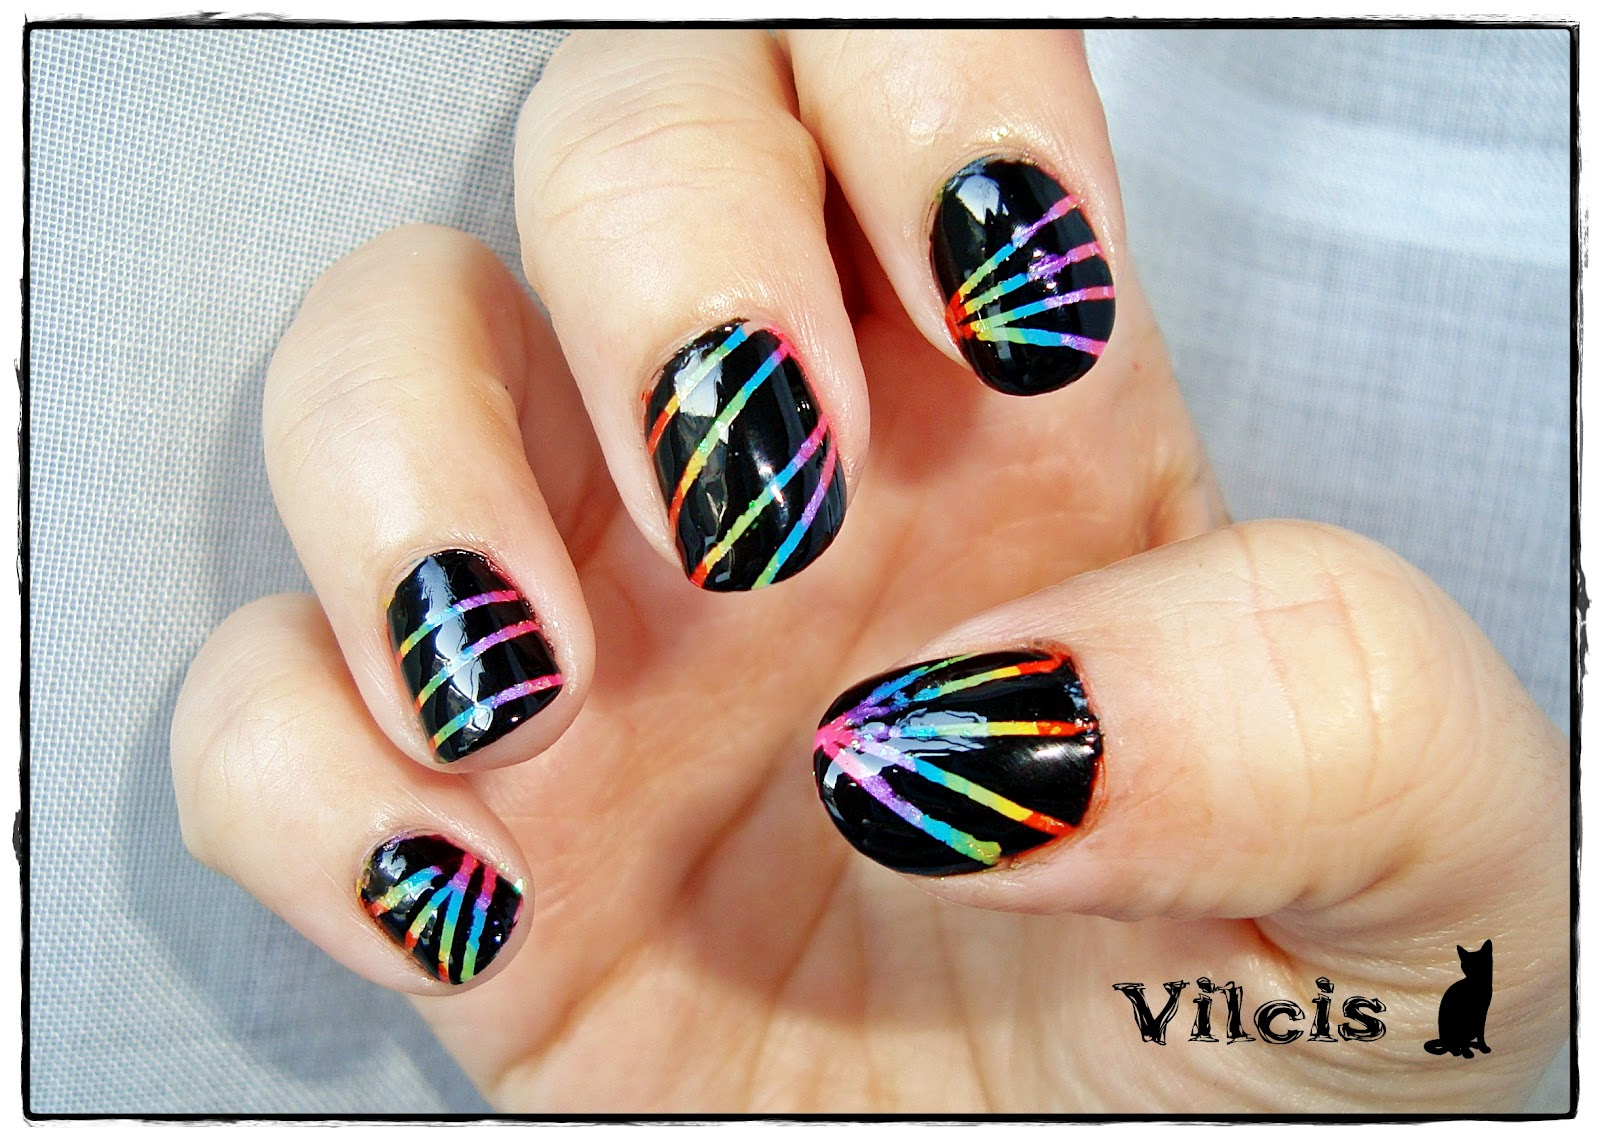 Vilcis nail designs: Desafío 31 días - Día 9 - Uñas arcoíris